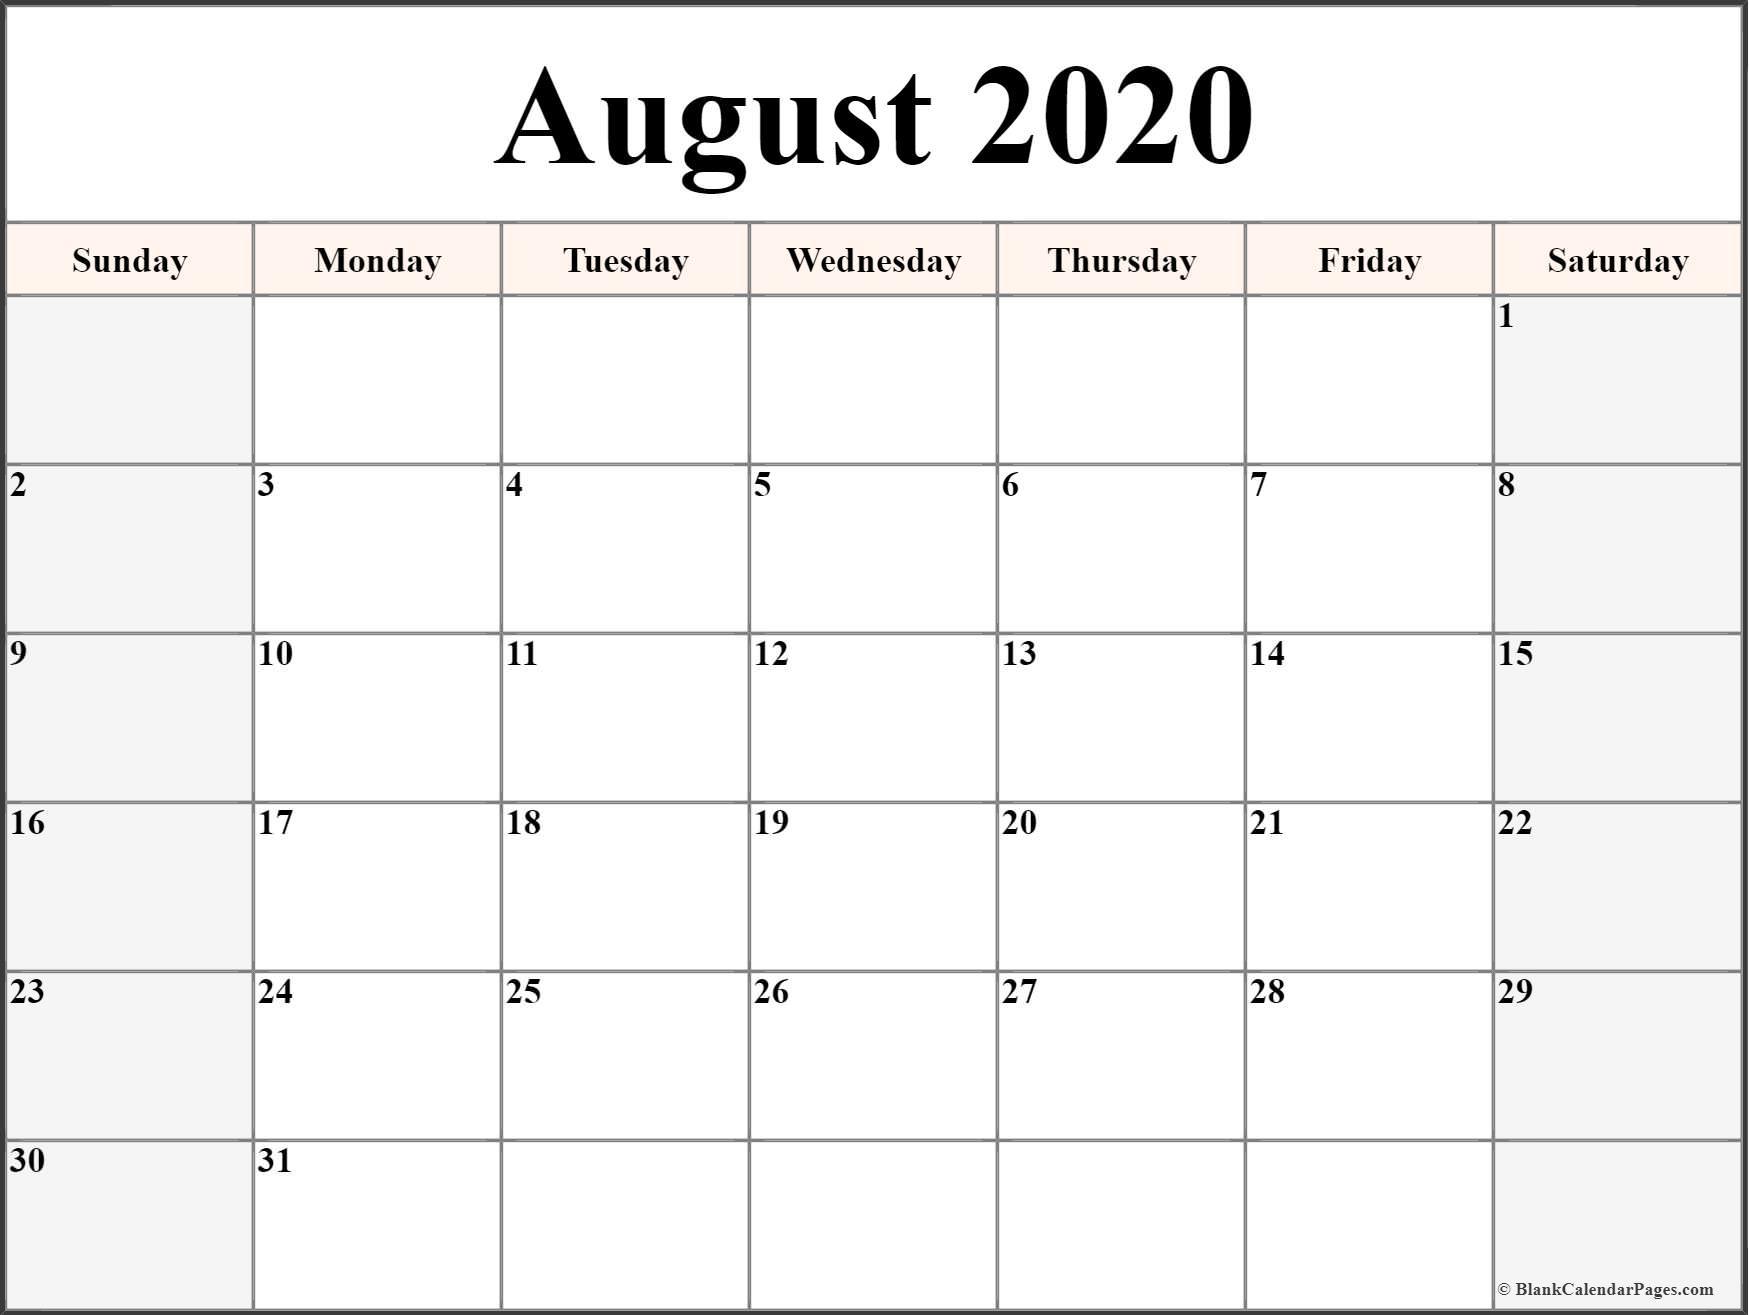 August 2020 Calendar   Free Printable Monthly Calendars pertaining to Kid Freiendly August 2020 Calendars